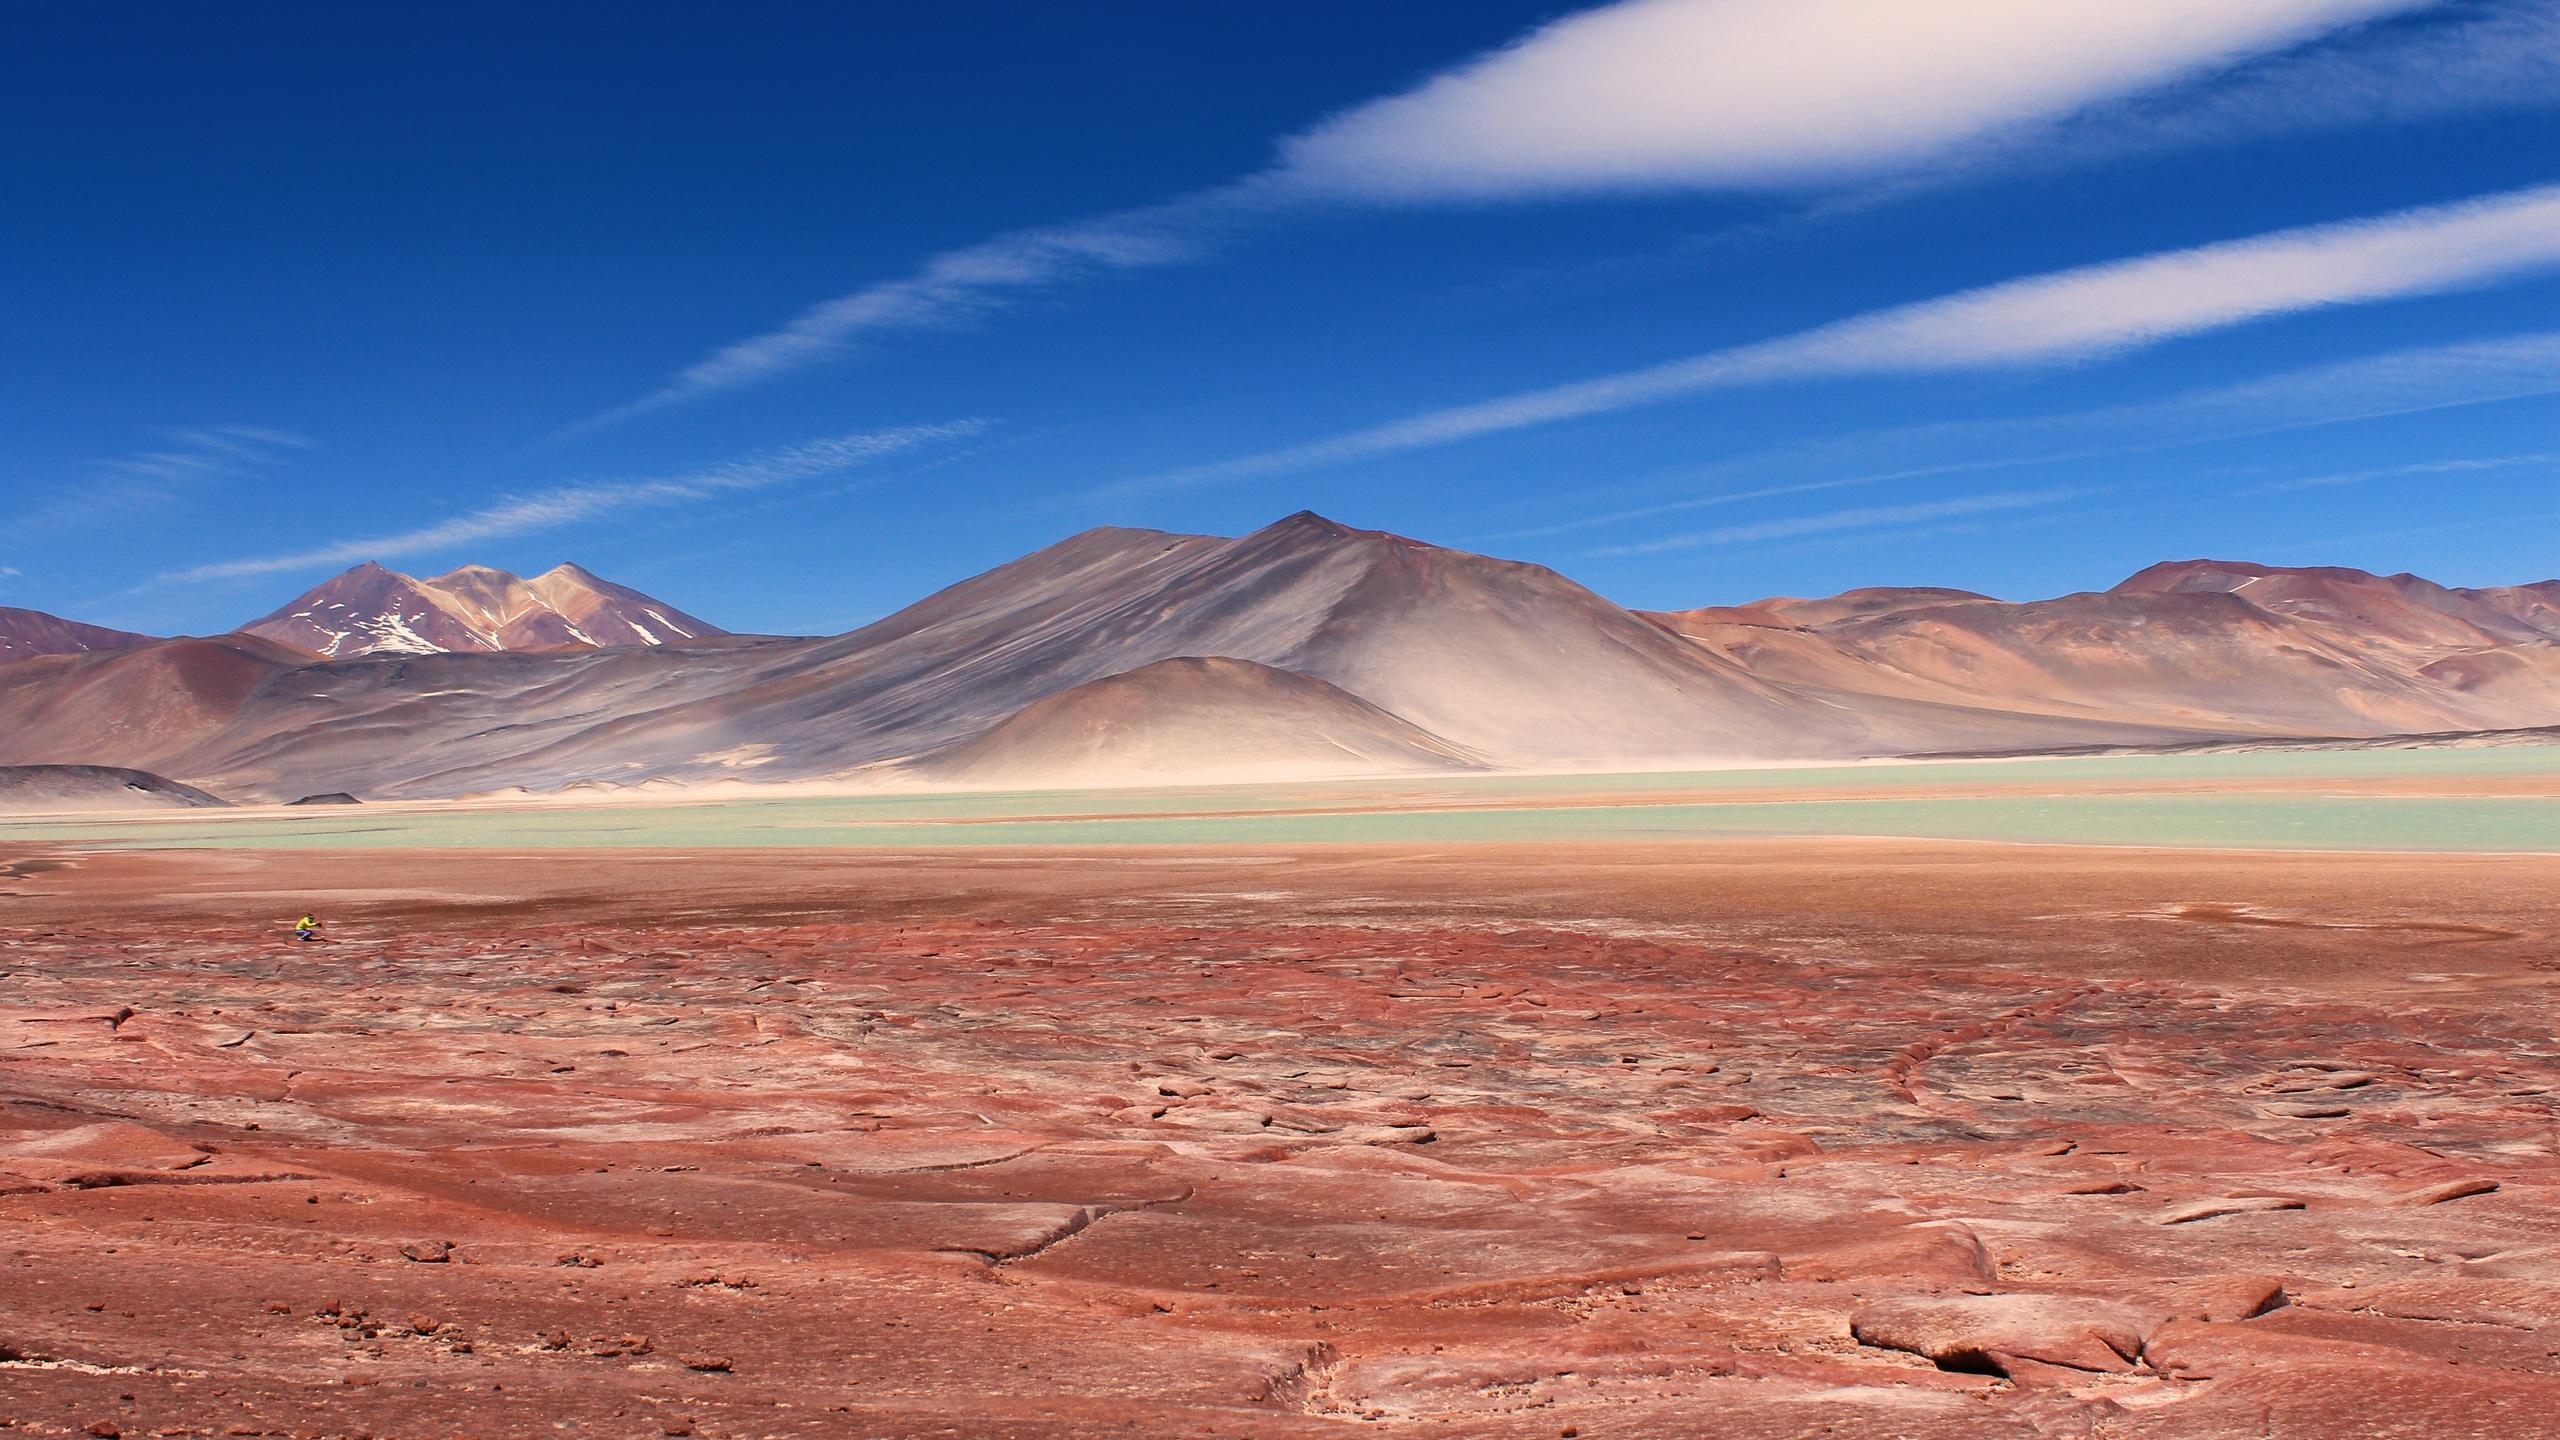 2560x1440 desert landscape sky mountain travel nature 1440p